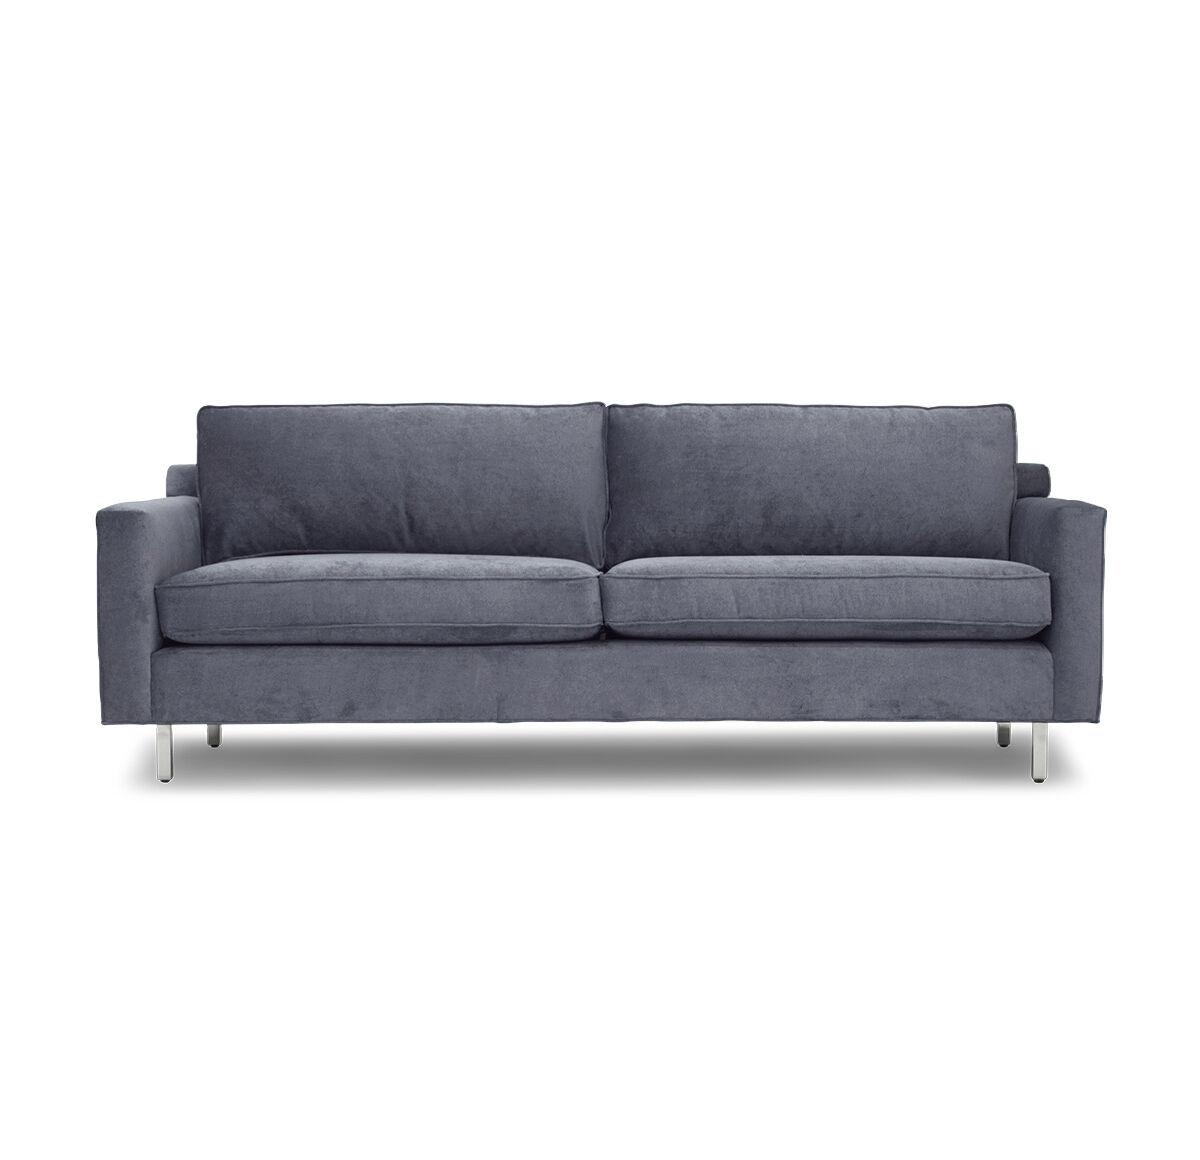 mitc gold hunter sofa best value brands studio